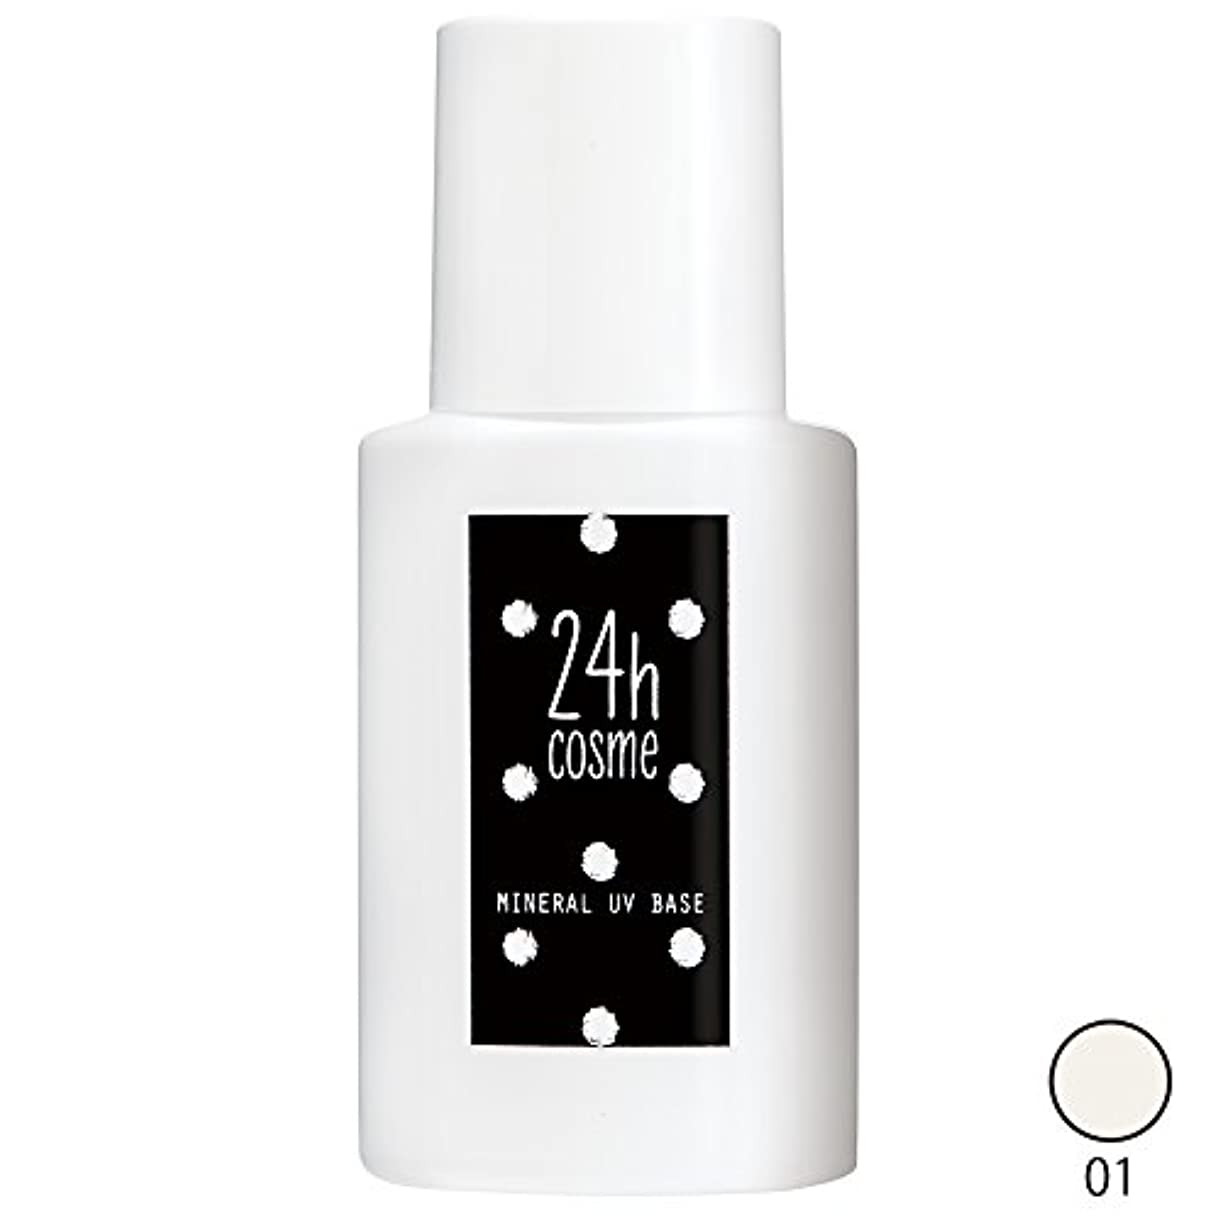 24h cosme 24 ミネラルUVベース40 01トーンアップ SPF40/PA+++